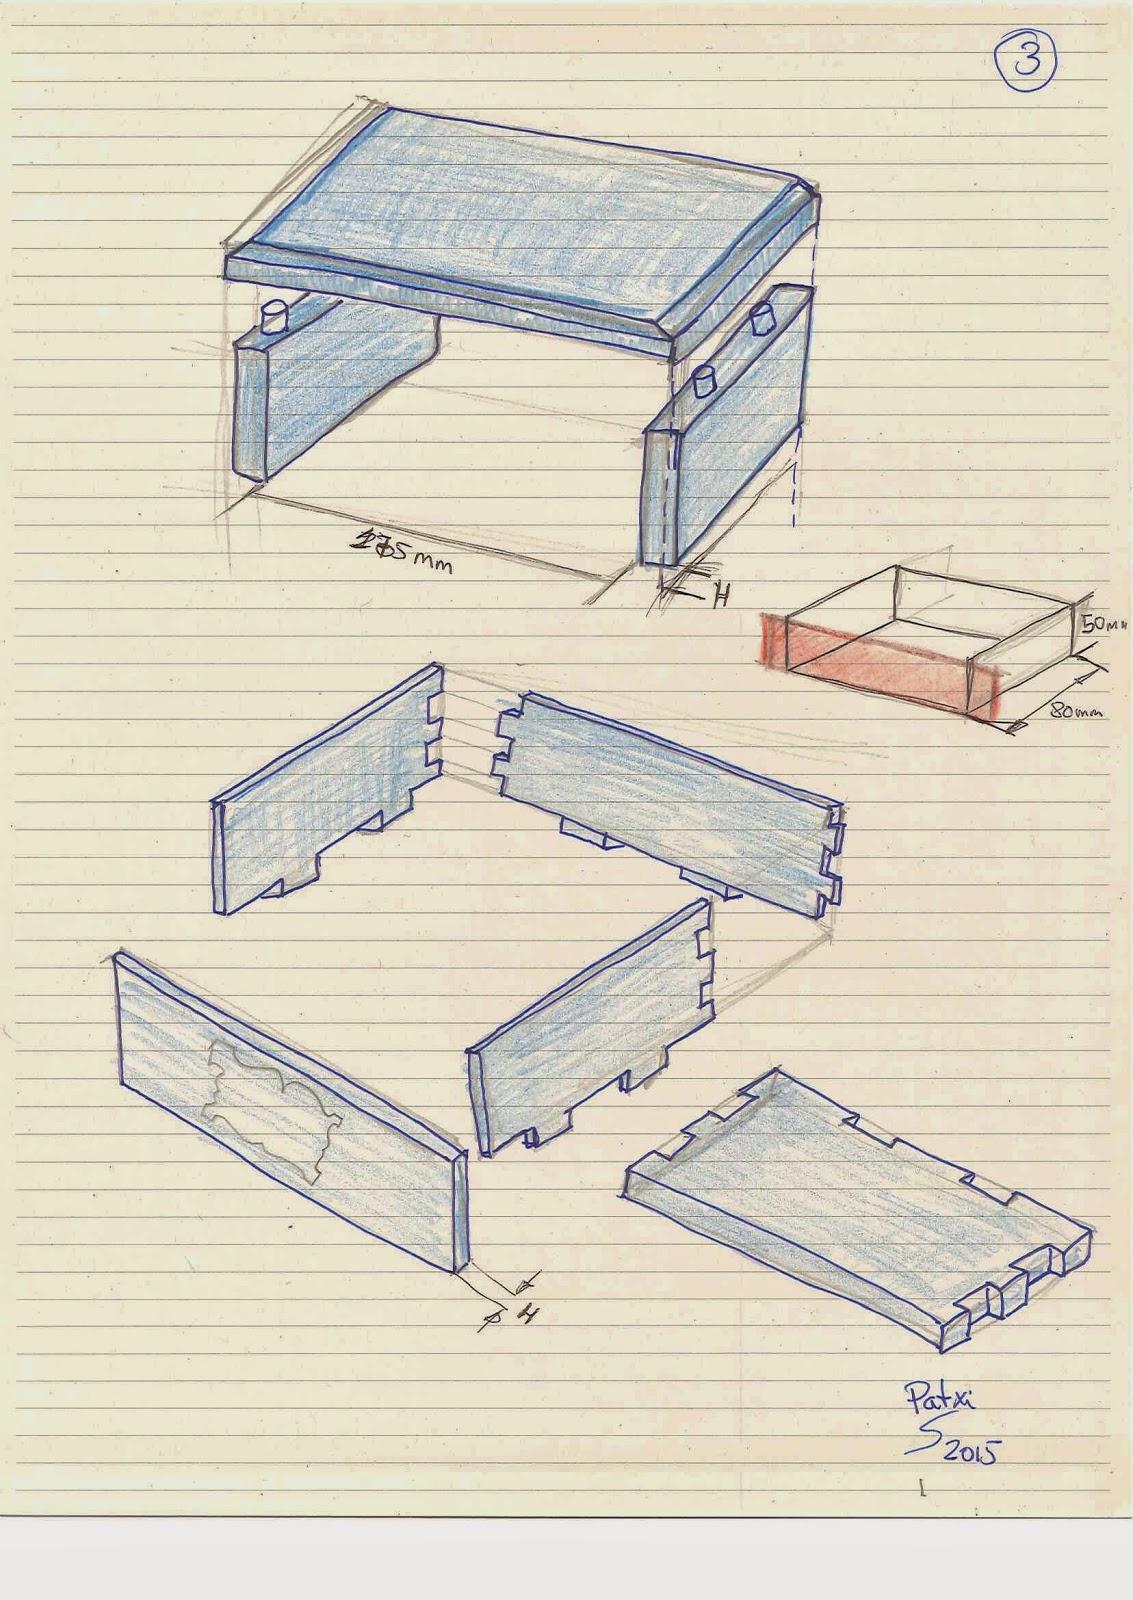 Soporte de pipas hecho de madera de palet. Planos.